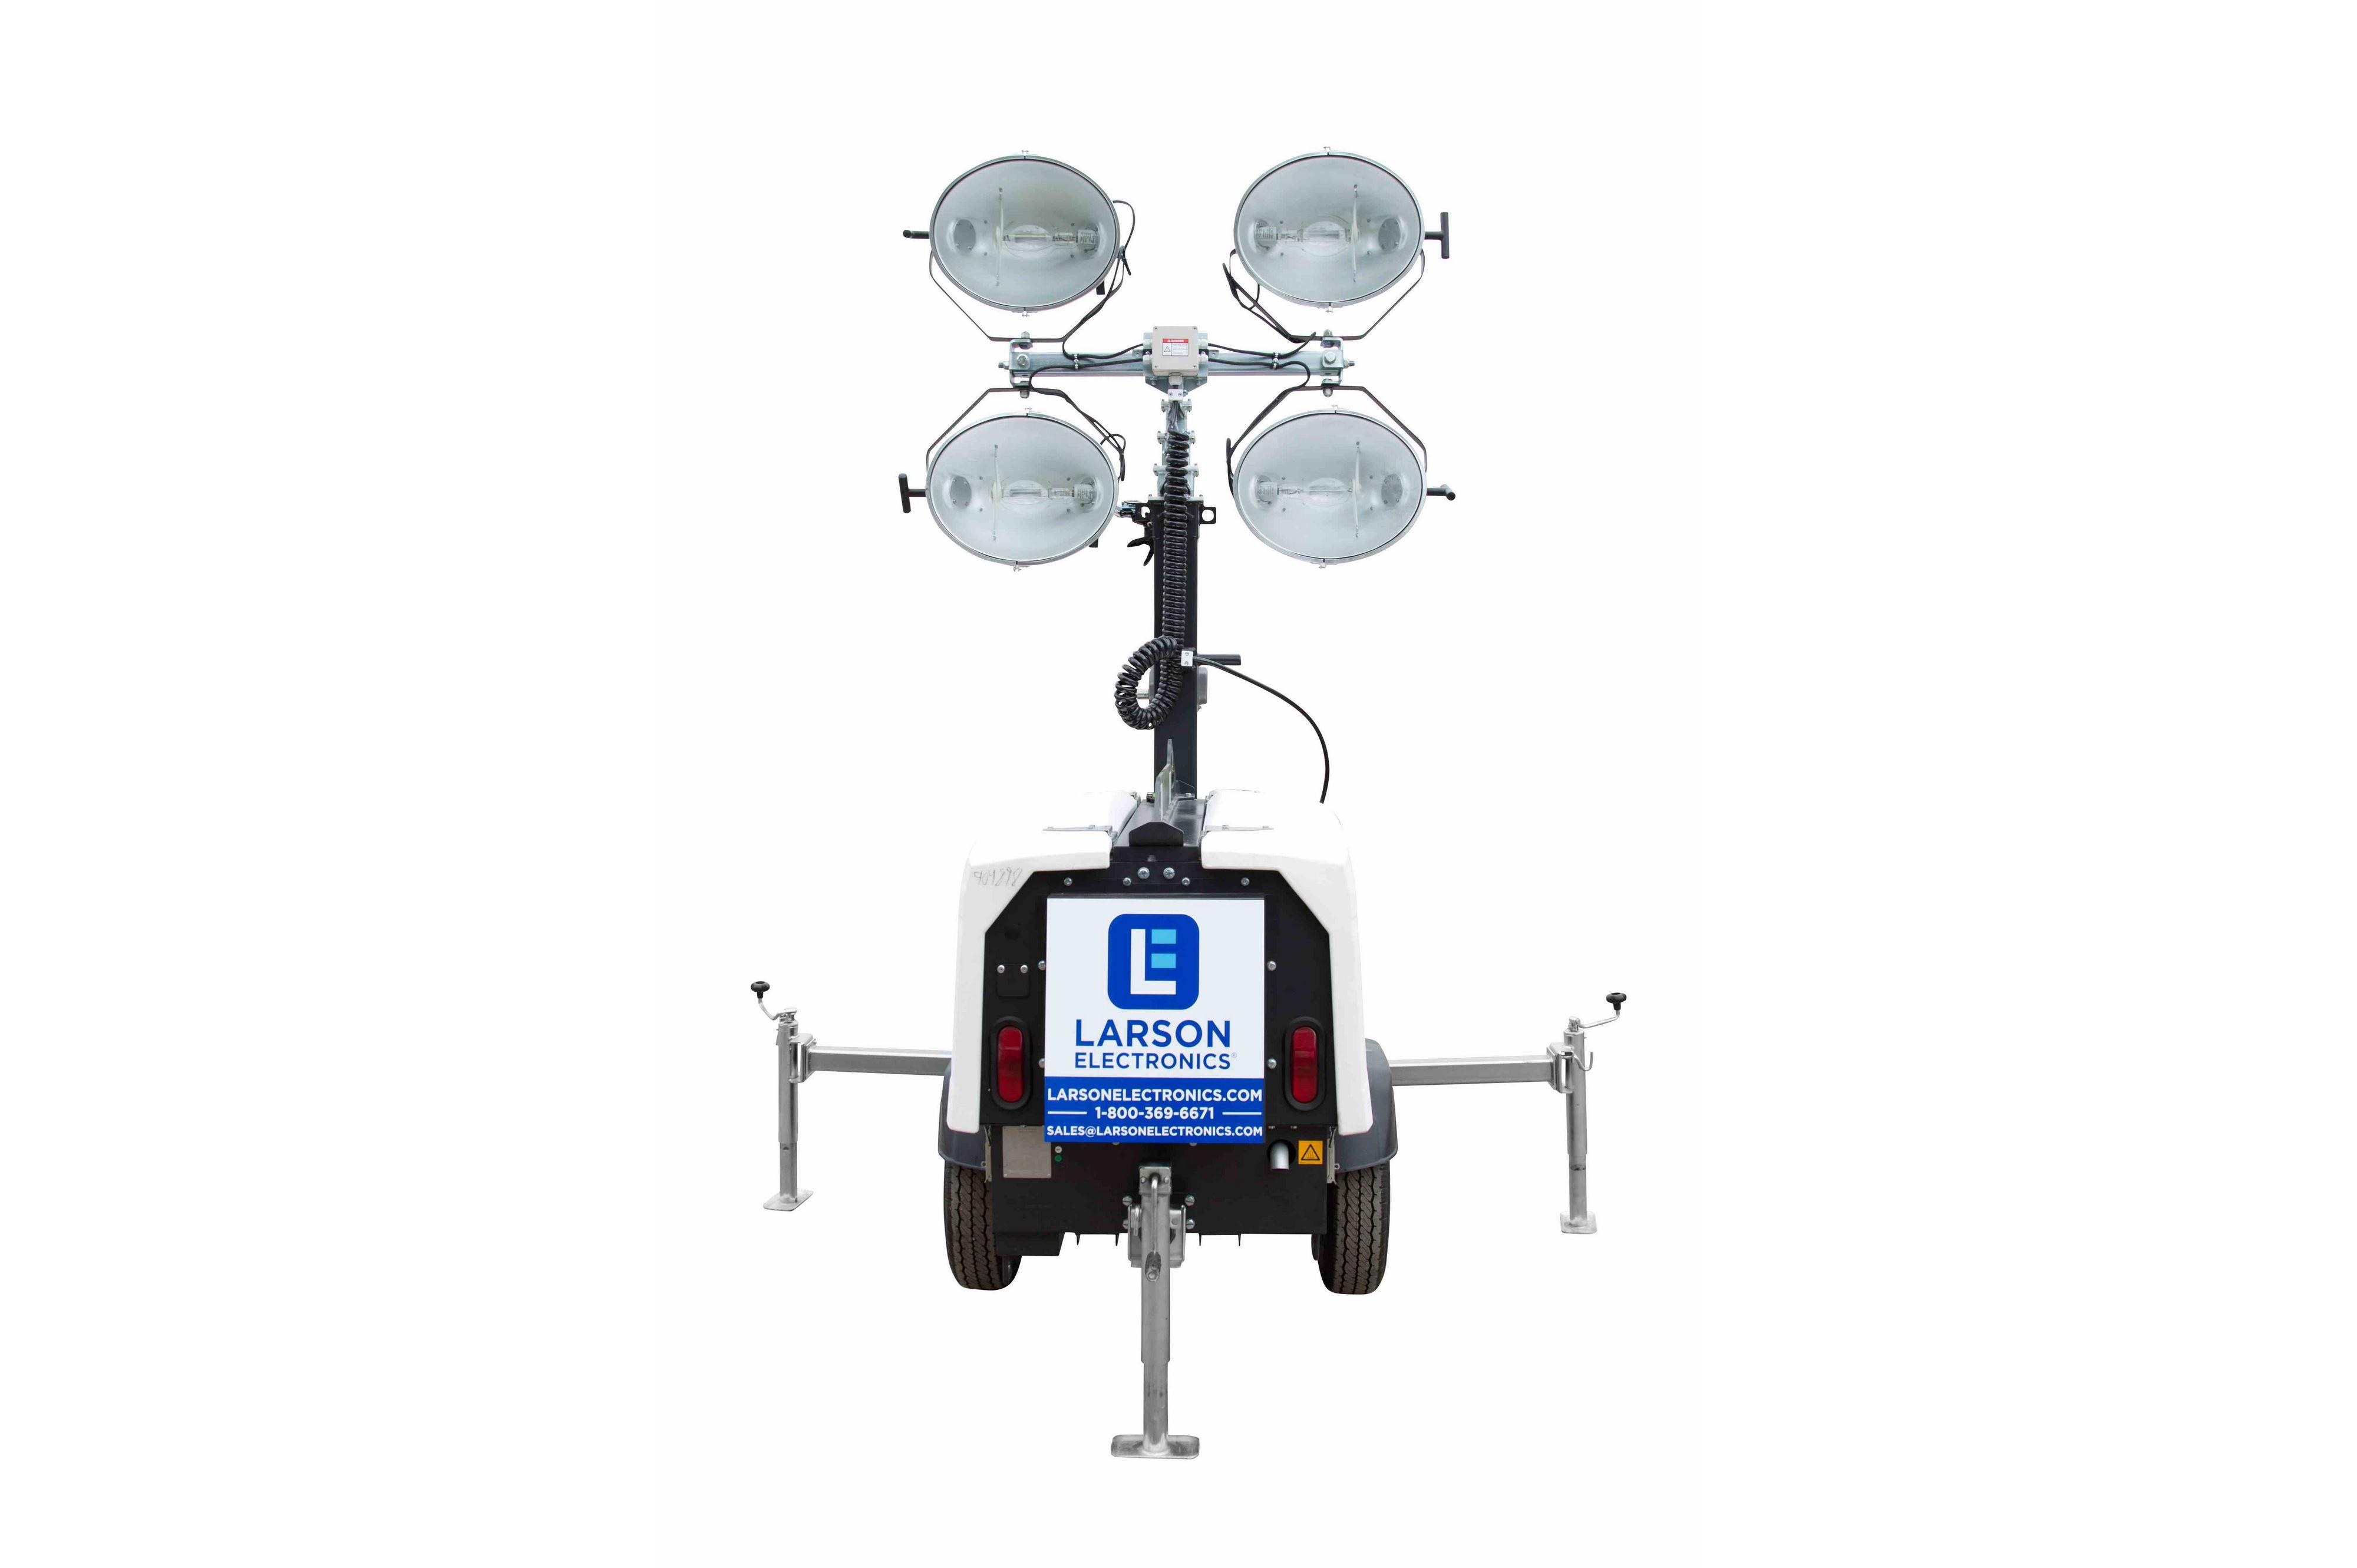 25 Mobile Light Tower with Diesel Engine Generator 4X1000 Watt